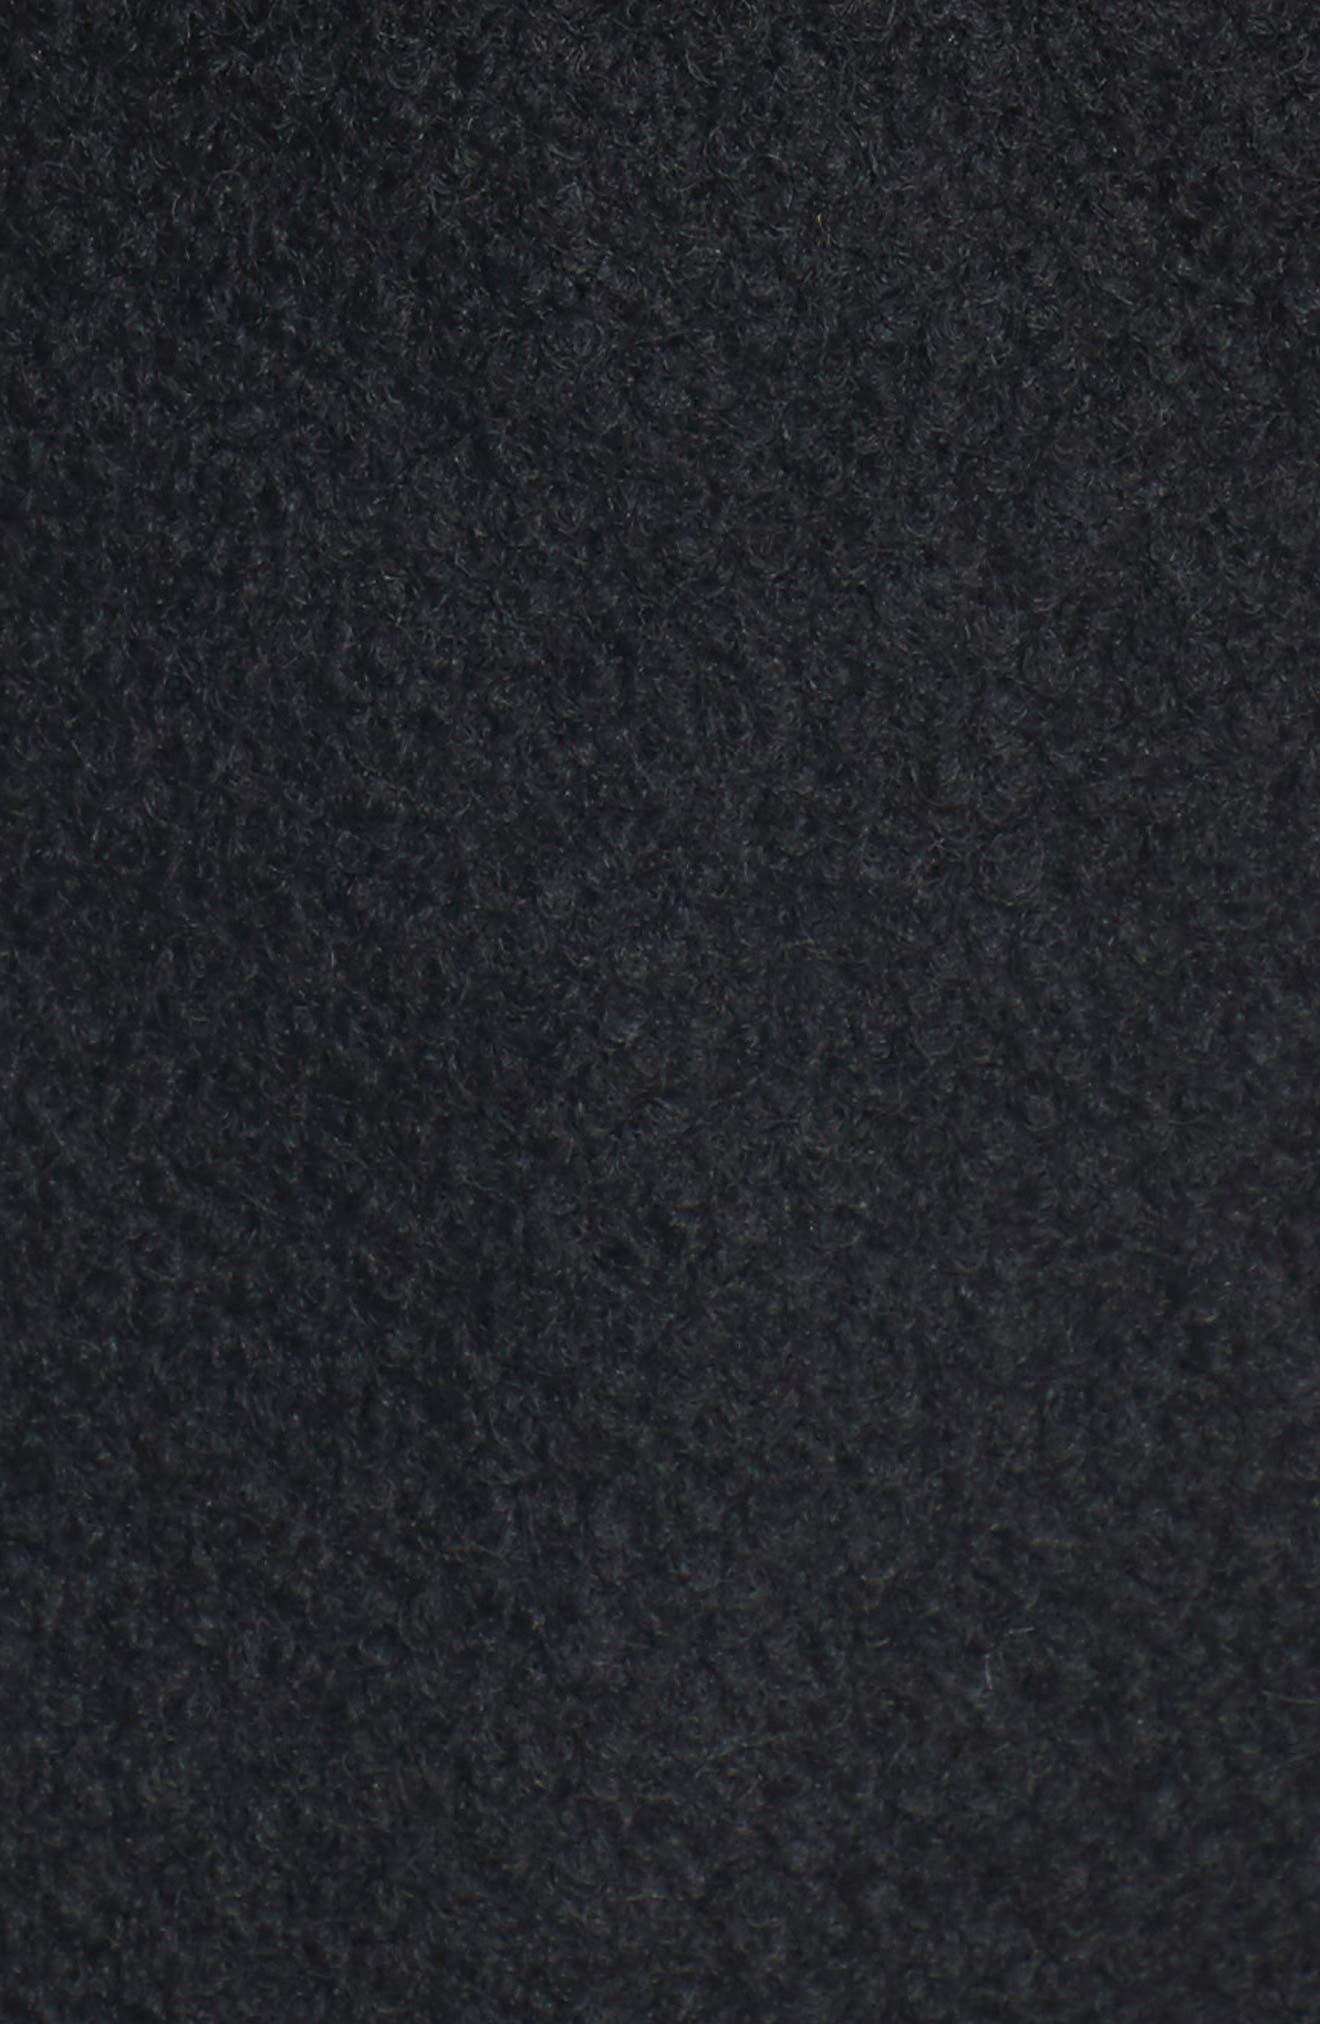 Hooded Wool Blend Bouclé Jacket with Faux Fur Trim,                             Alternate thumbnail 6, color,                             001